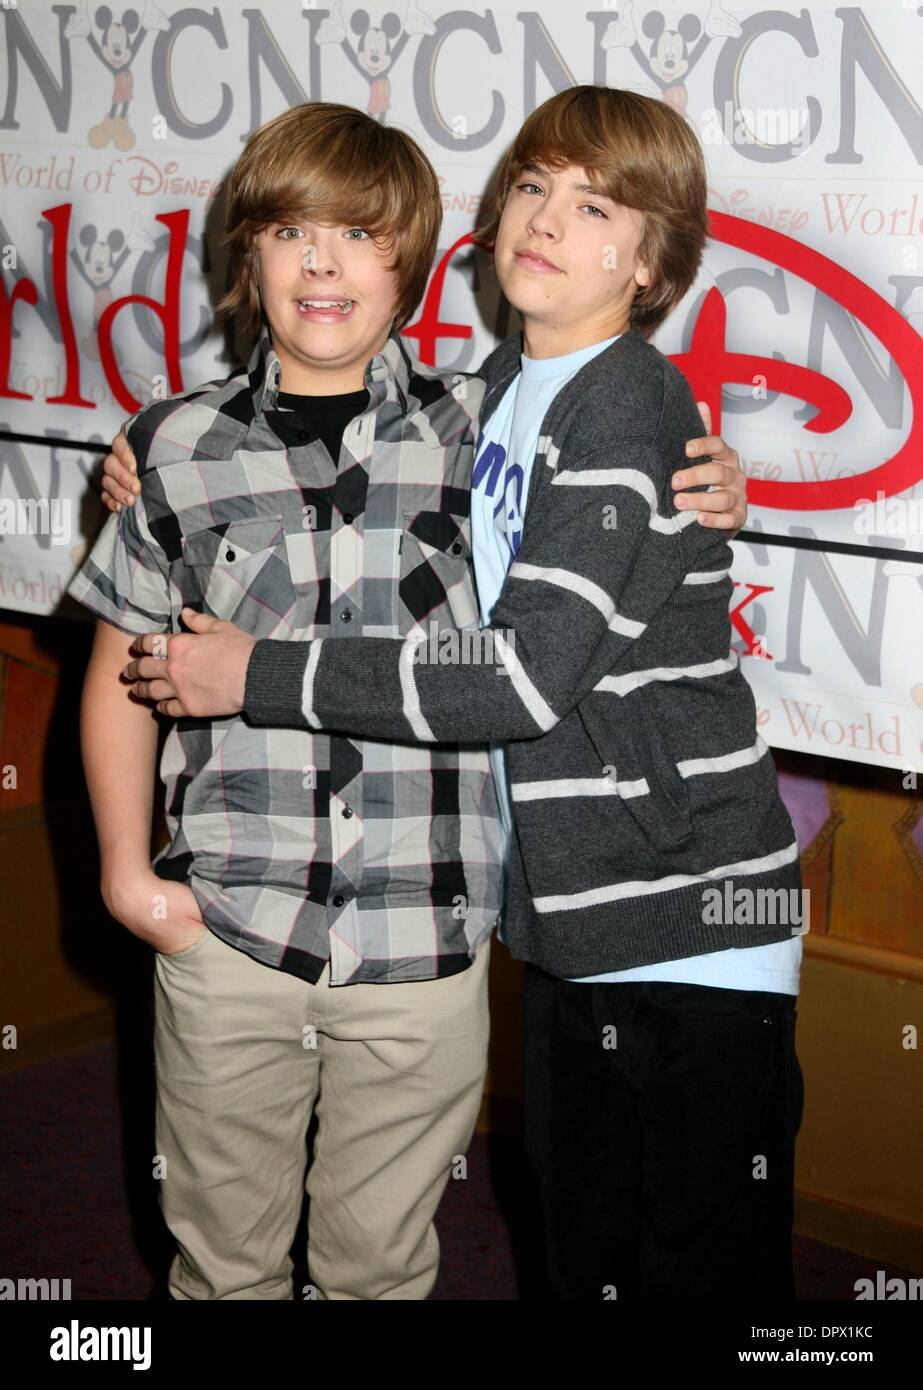 Mar 06, 2009 - New York, New York, USA - Actors (L) DYLAN ...